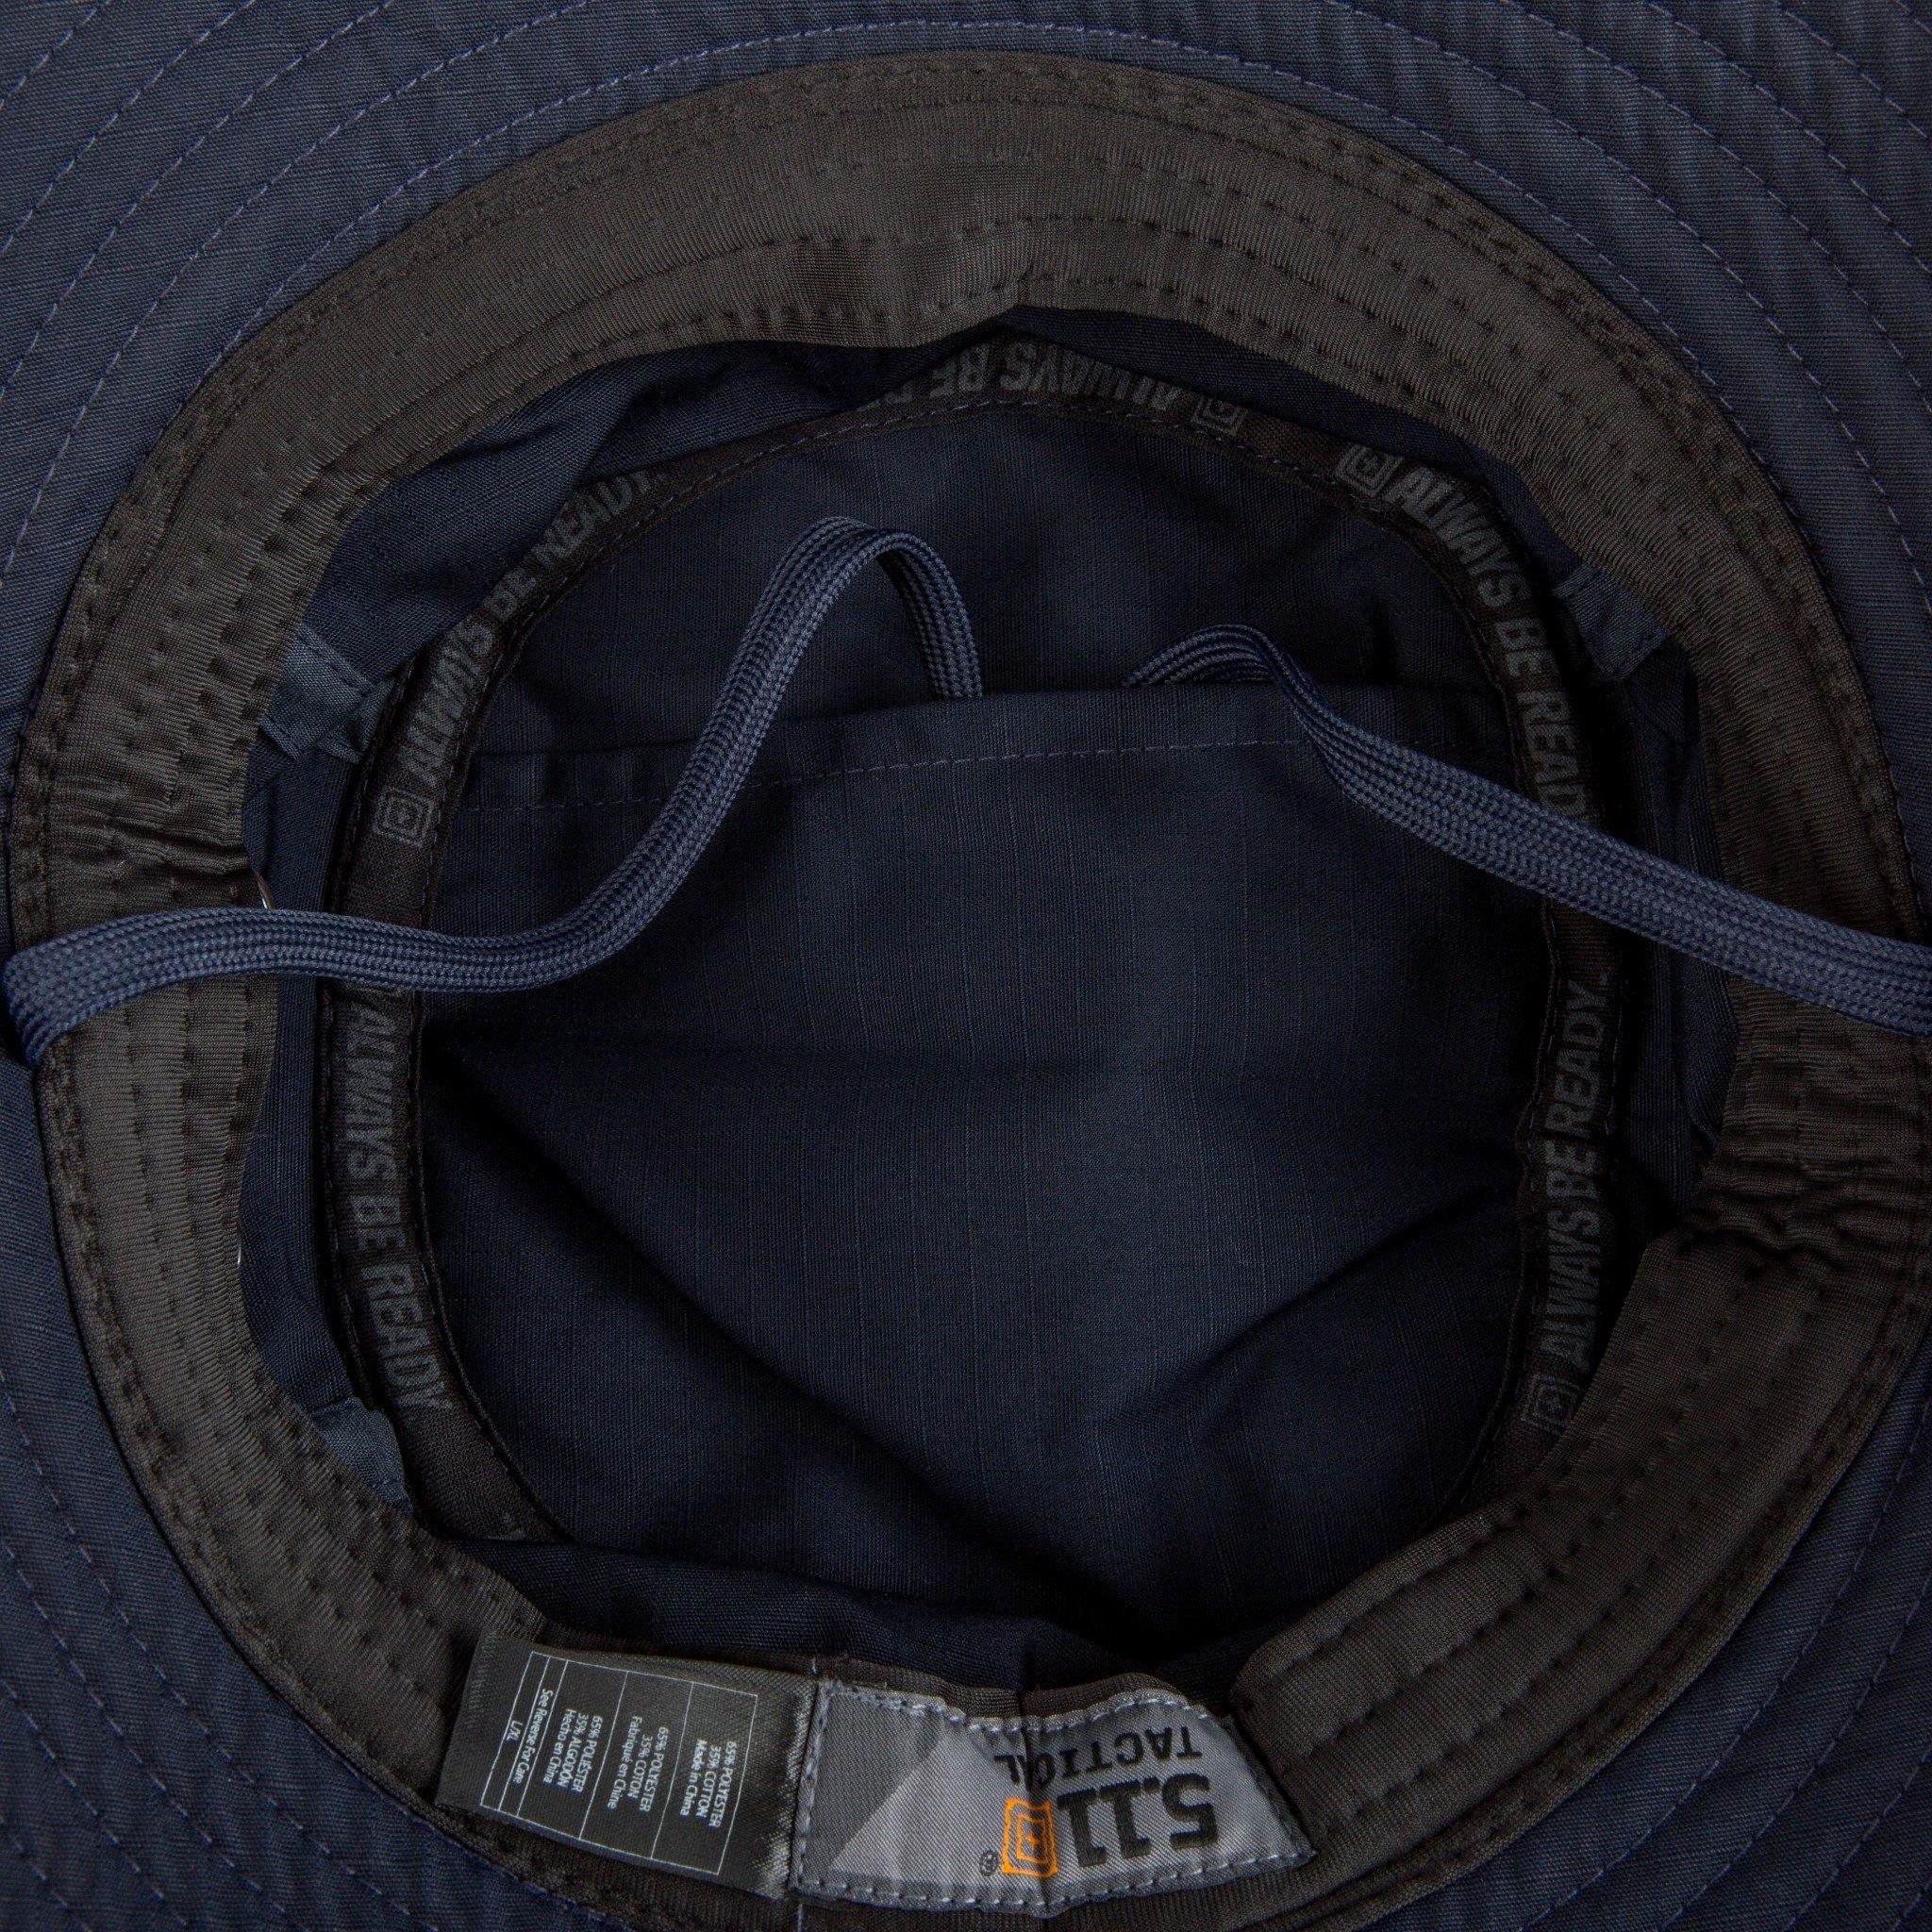 Nón 5.11 Tactical Boonie Hat – Dark Navy